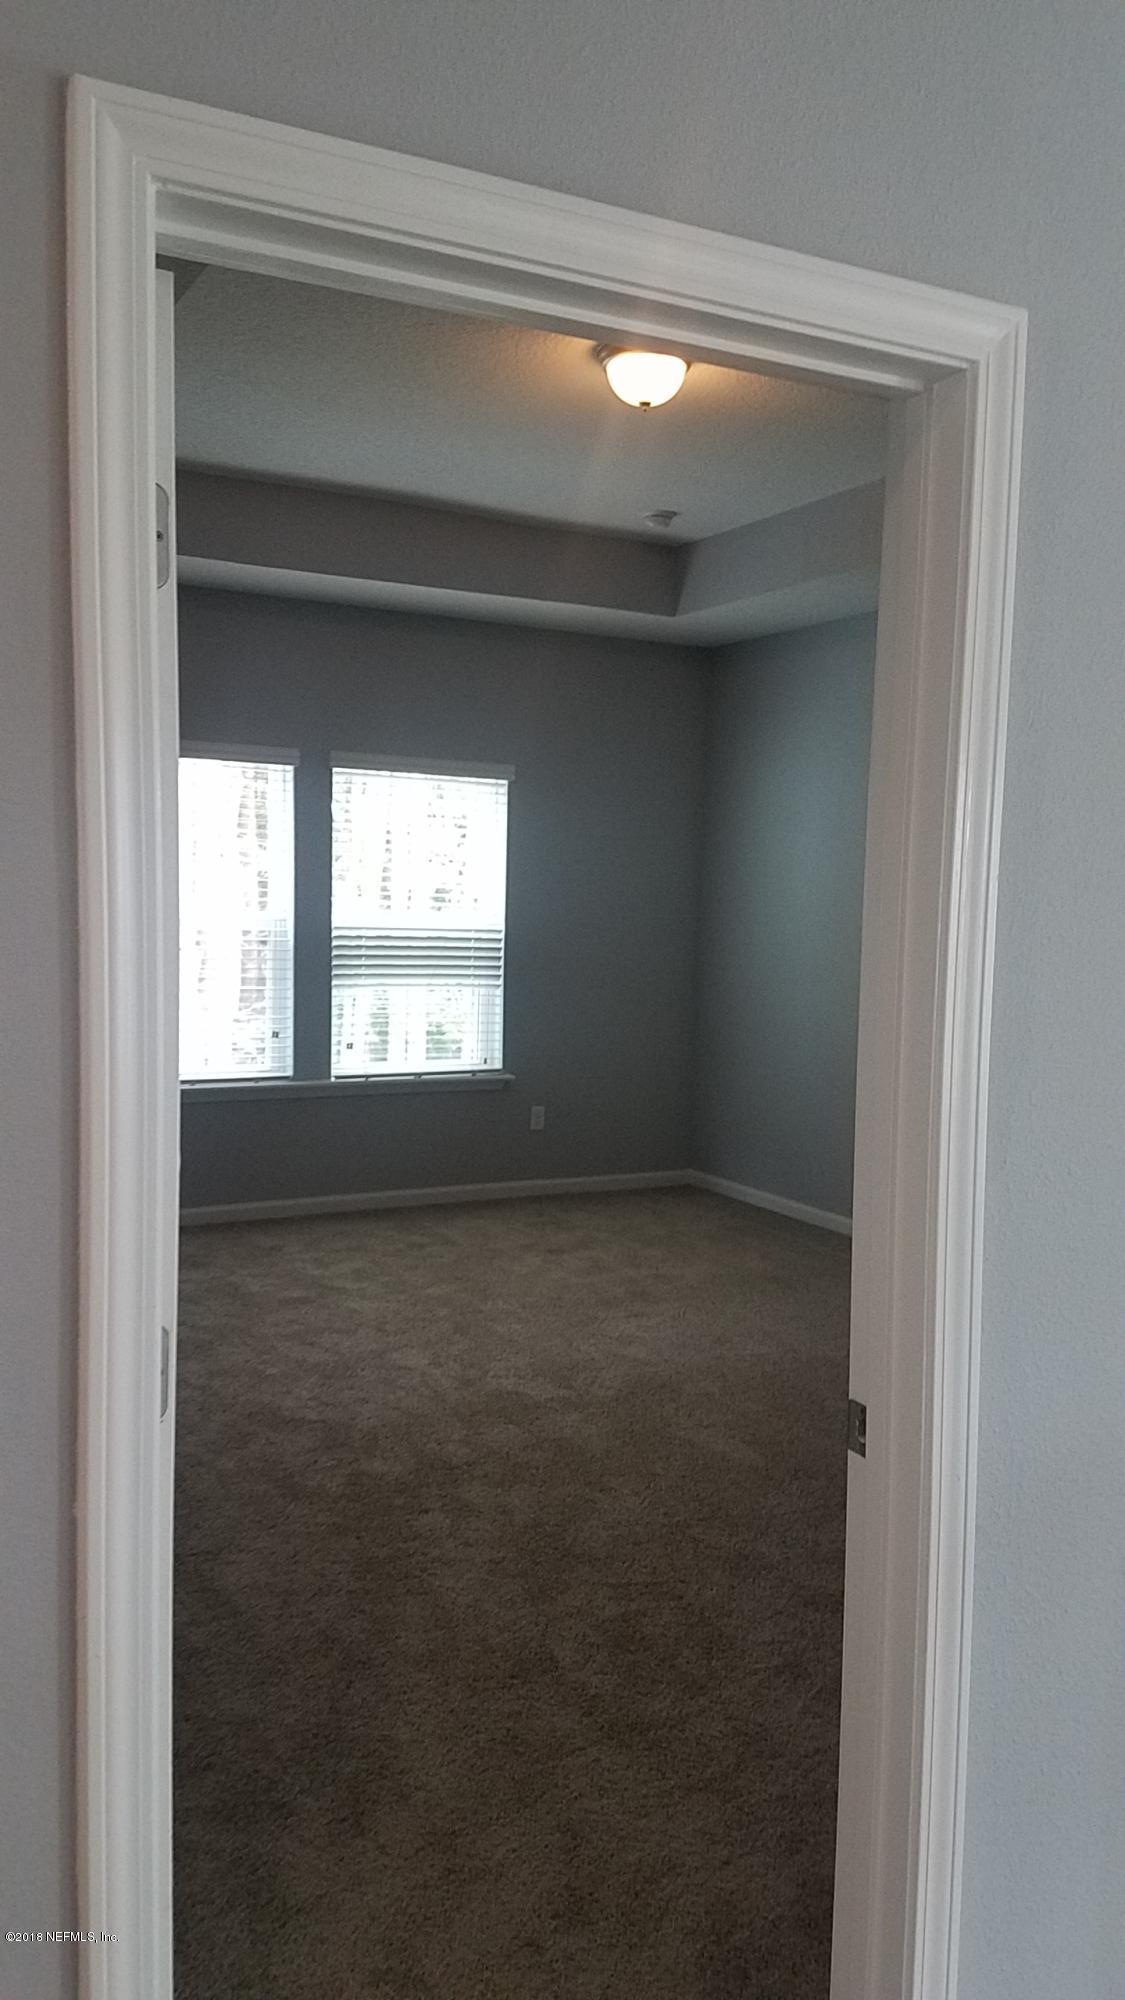 2201 EAGLE TALON, FLEMING ISLAND, FLORIDA 32003, 4 Bedrooms Bedrooms, ,3 BathroomsBathrooms,Residential - single family,For sale,EAGLE TALON,943608